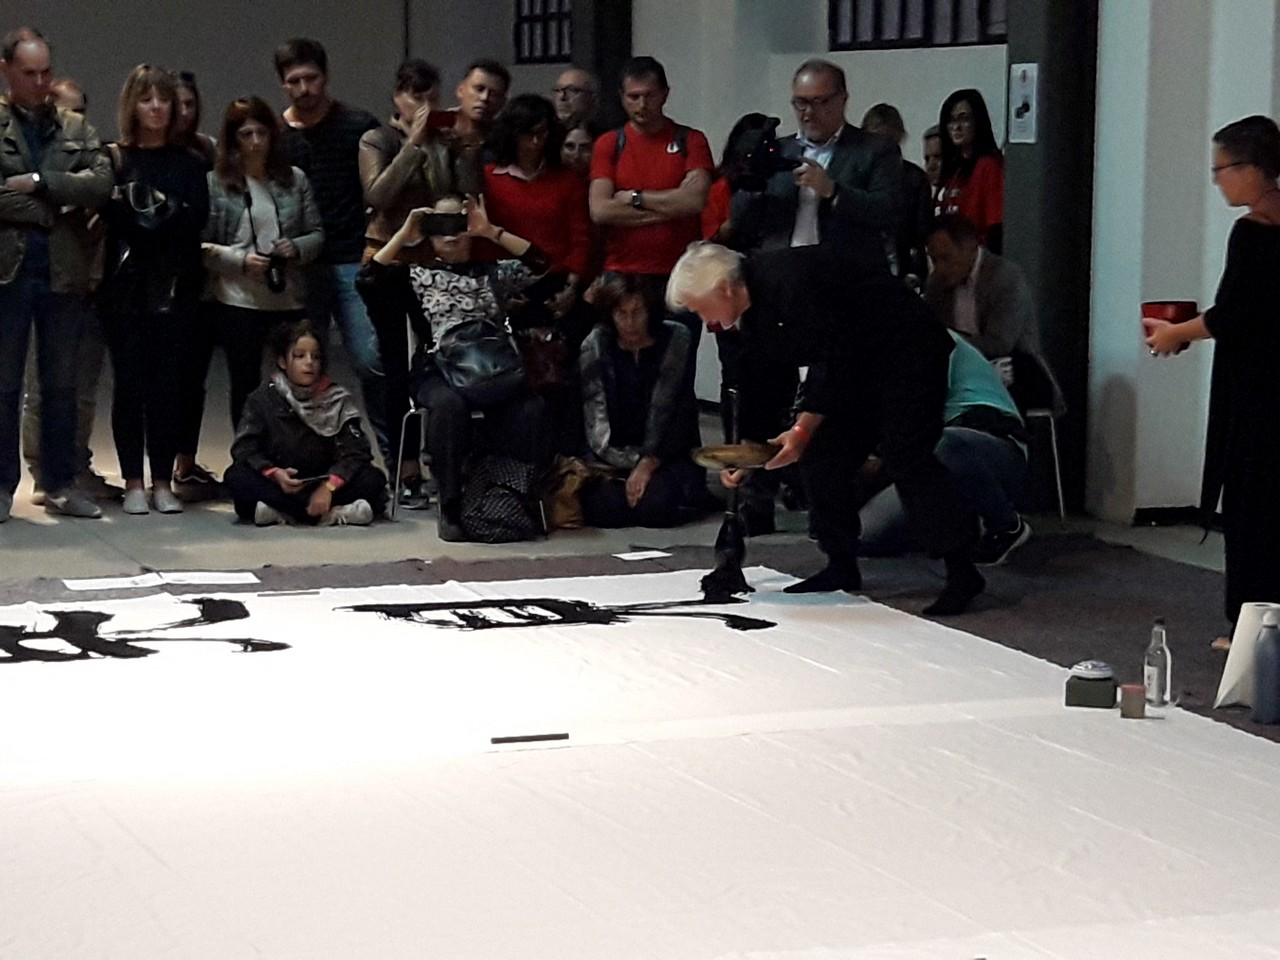 JapanFestival-Milano2018-fotoPagineZeni_009